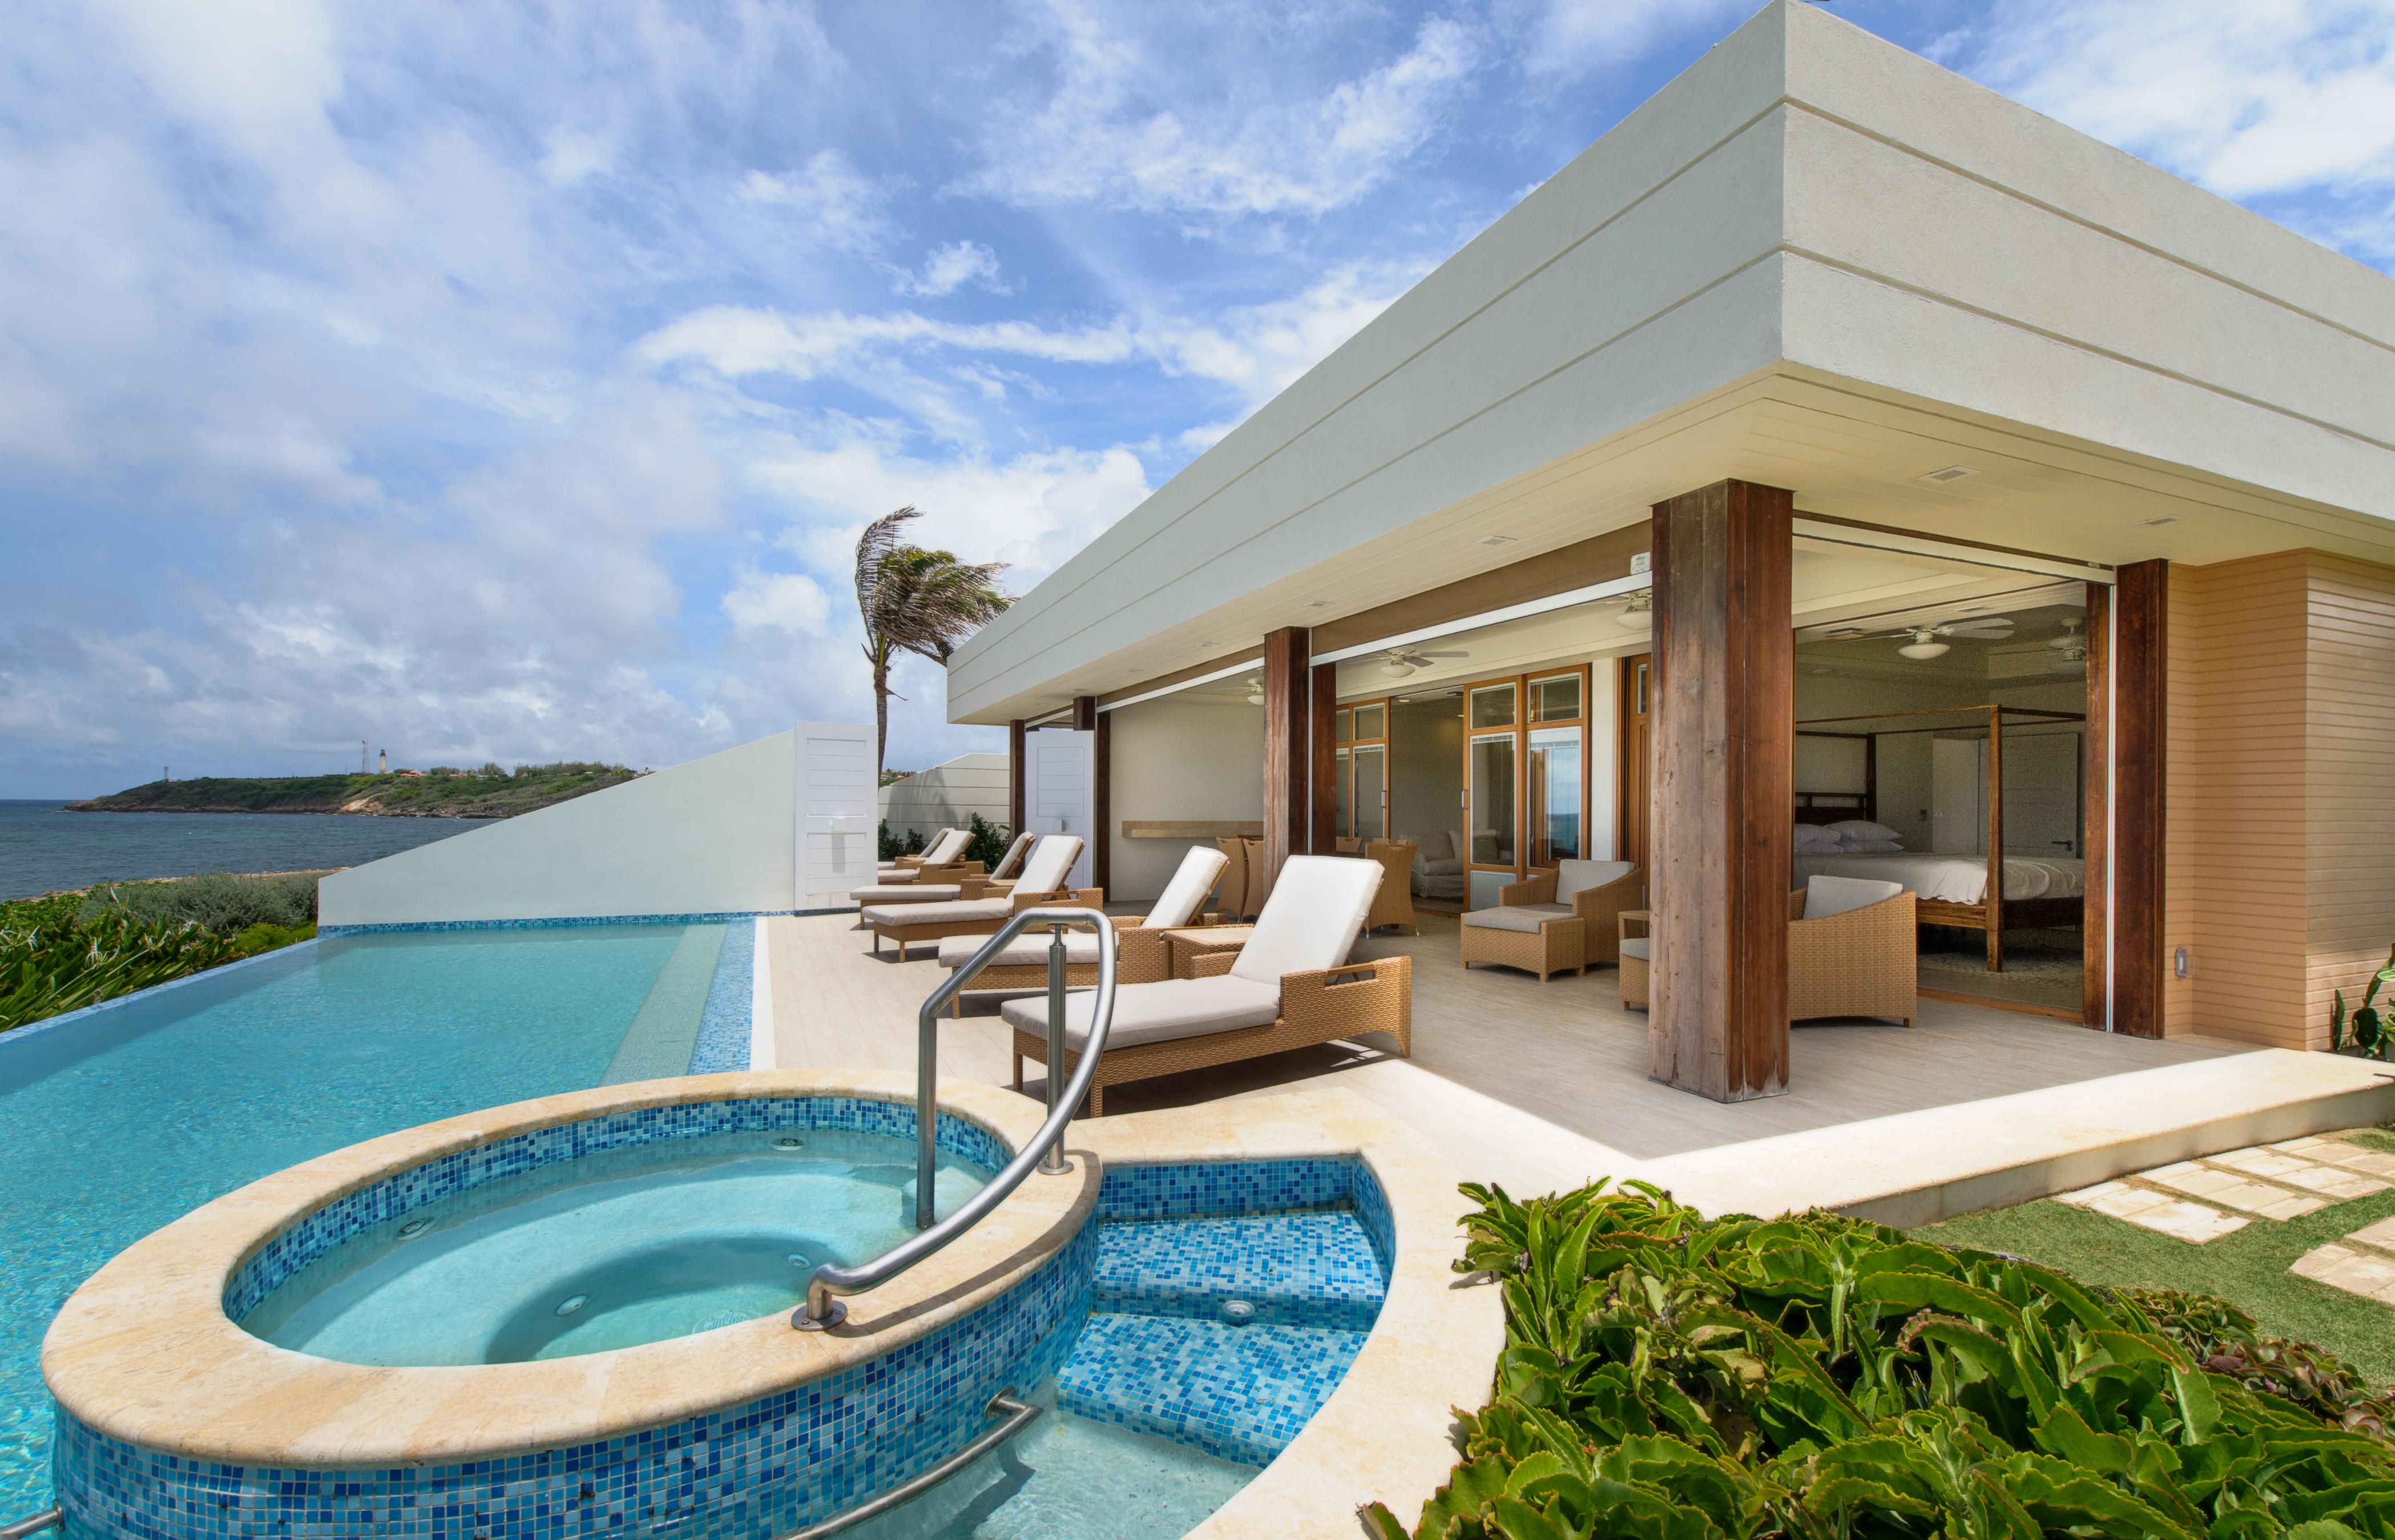 2 Bedroom Beach Houses for Sale Skeetes Bay St Phillip